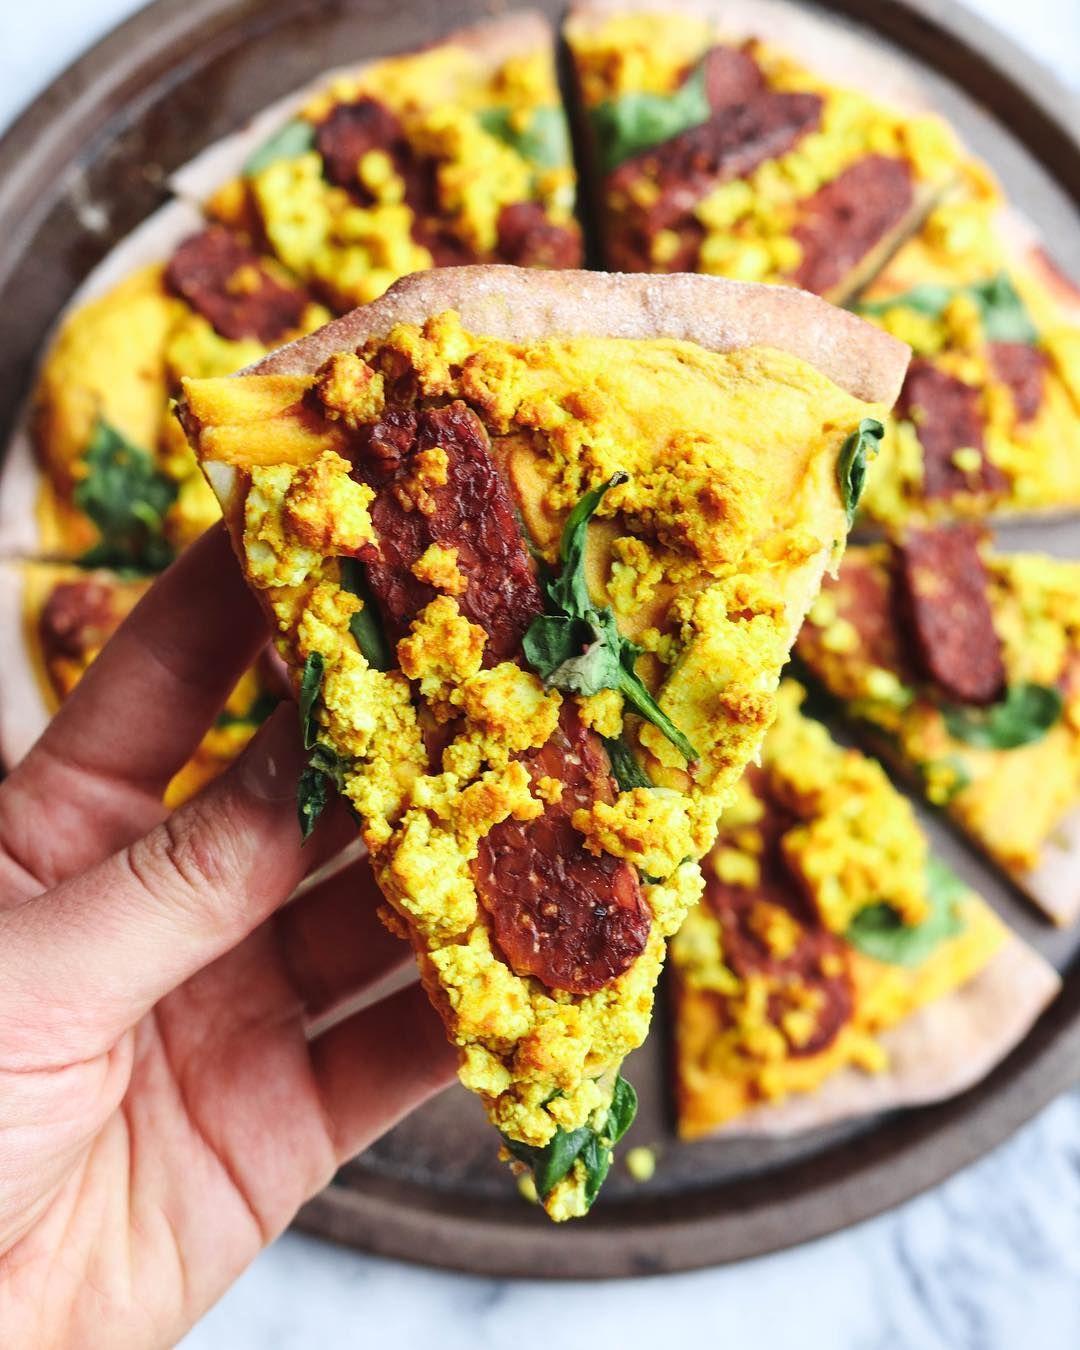 Cheezy Vegan Breakfast Pizza With Smoky Tempeh Bacon From My Bowl Recipe Vegan Breakfast Pizza Breakfast Pizza Vegan Breakfast